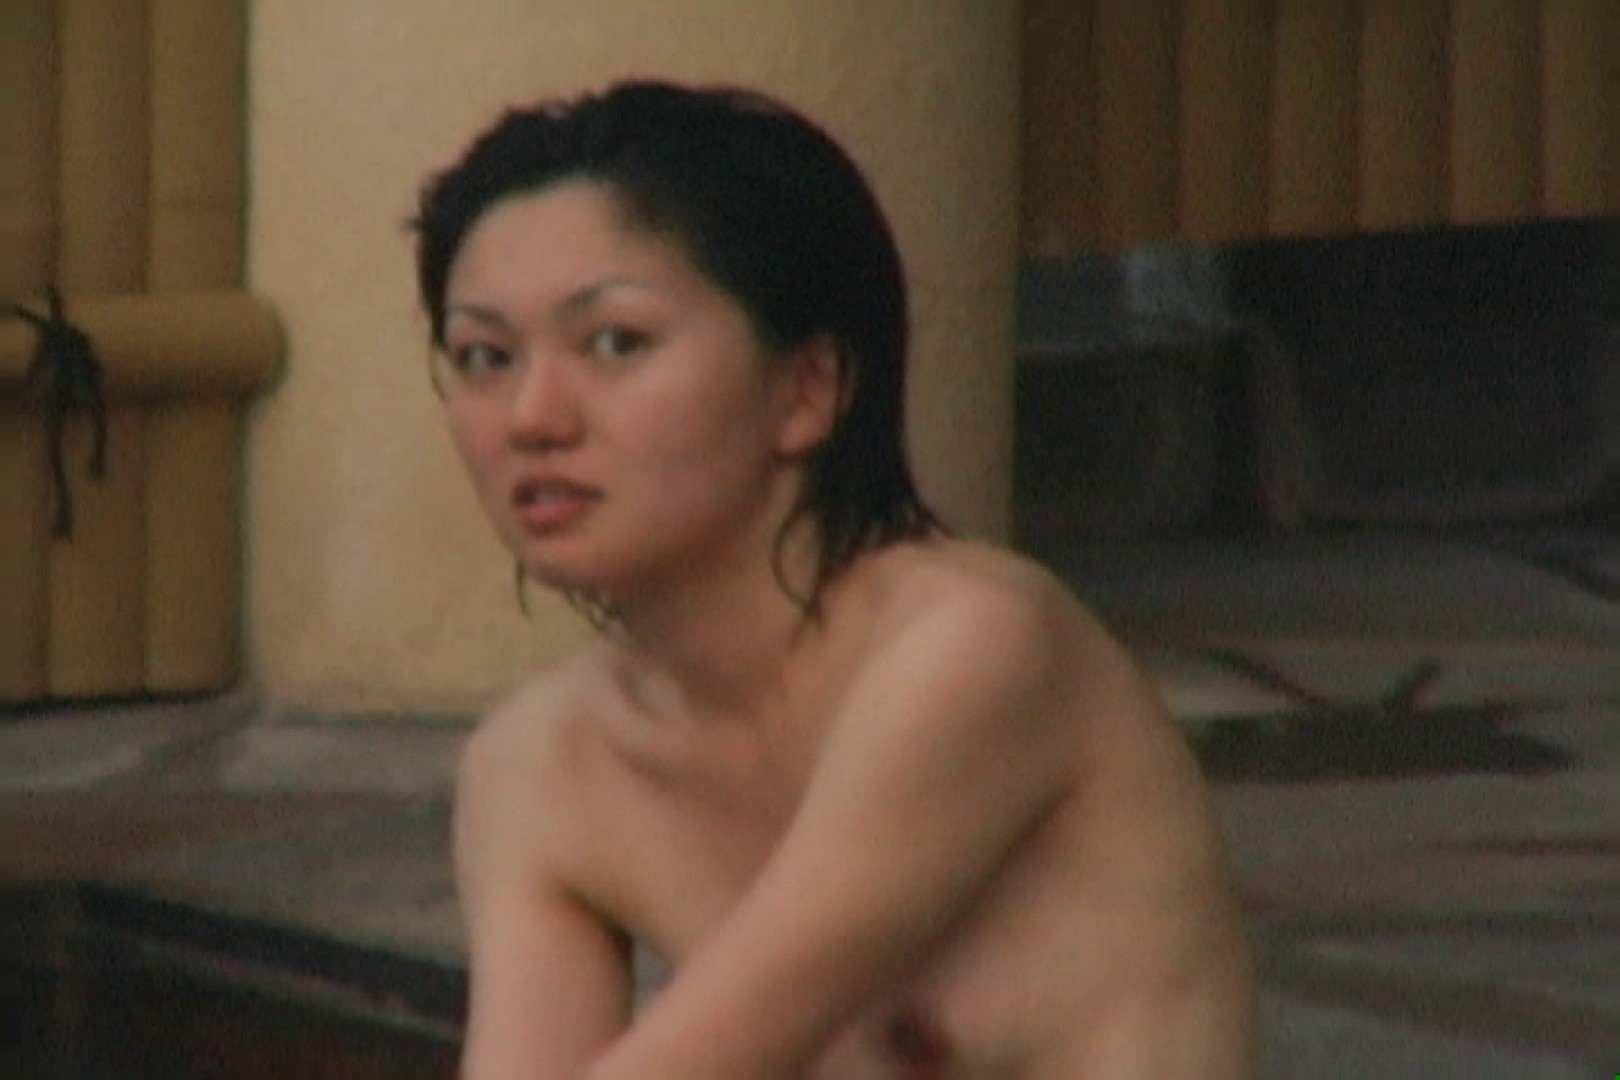 Aquaな露天風呂Vol.613 OL女体   露天  43連発 13